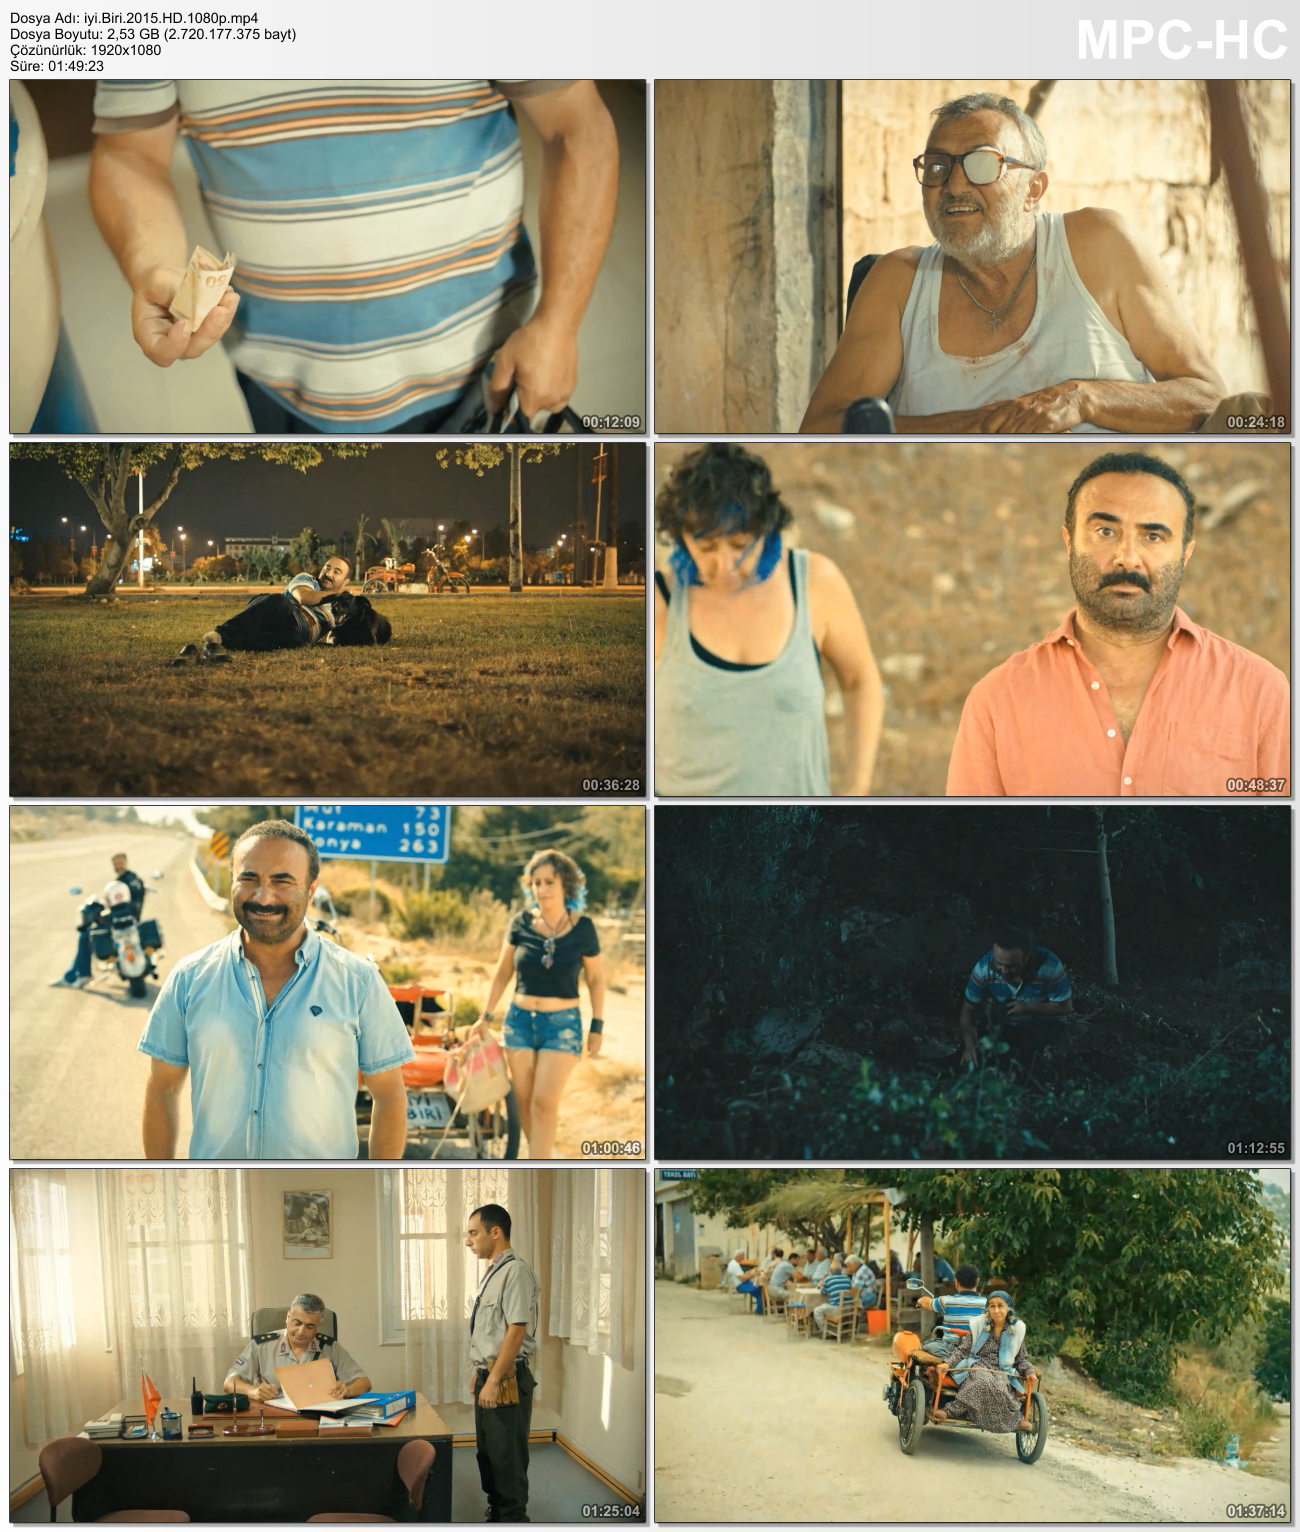 İyi Biri 2016 HDRip XviD Sansürsüz Yerli Film - Tek Link Film indir Tek Link  indir